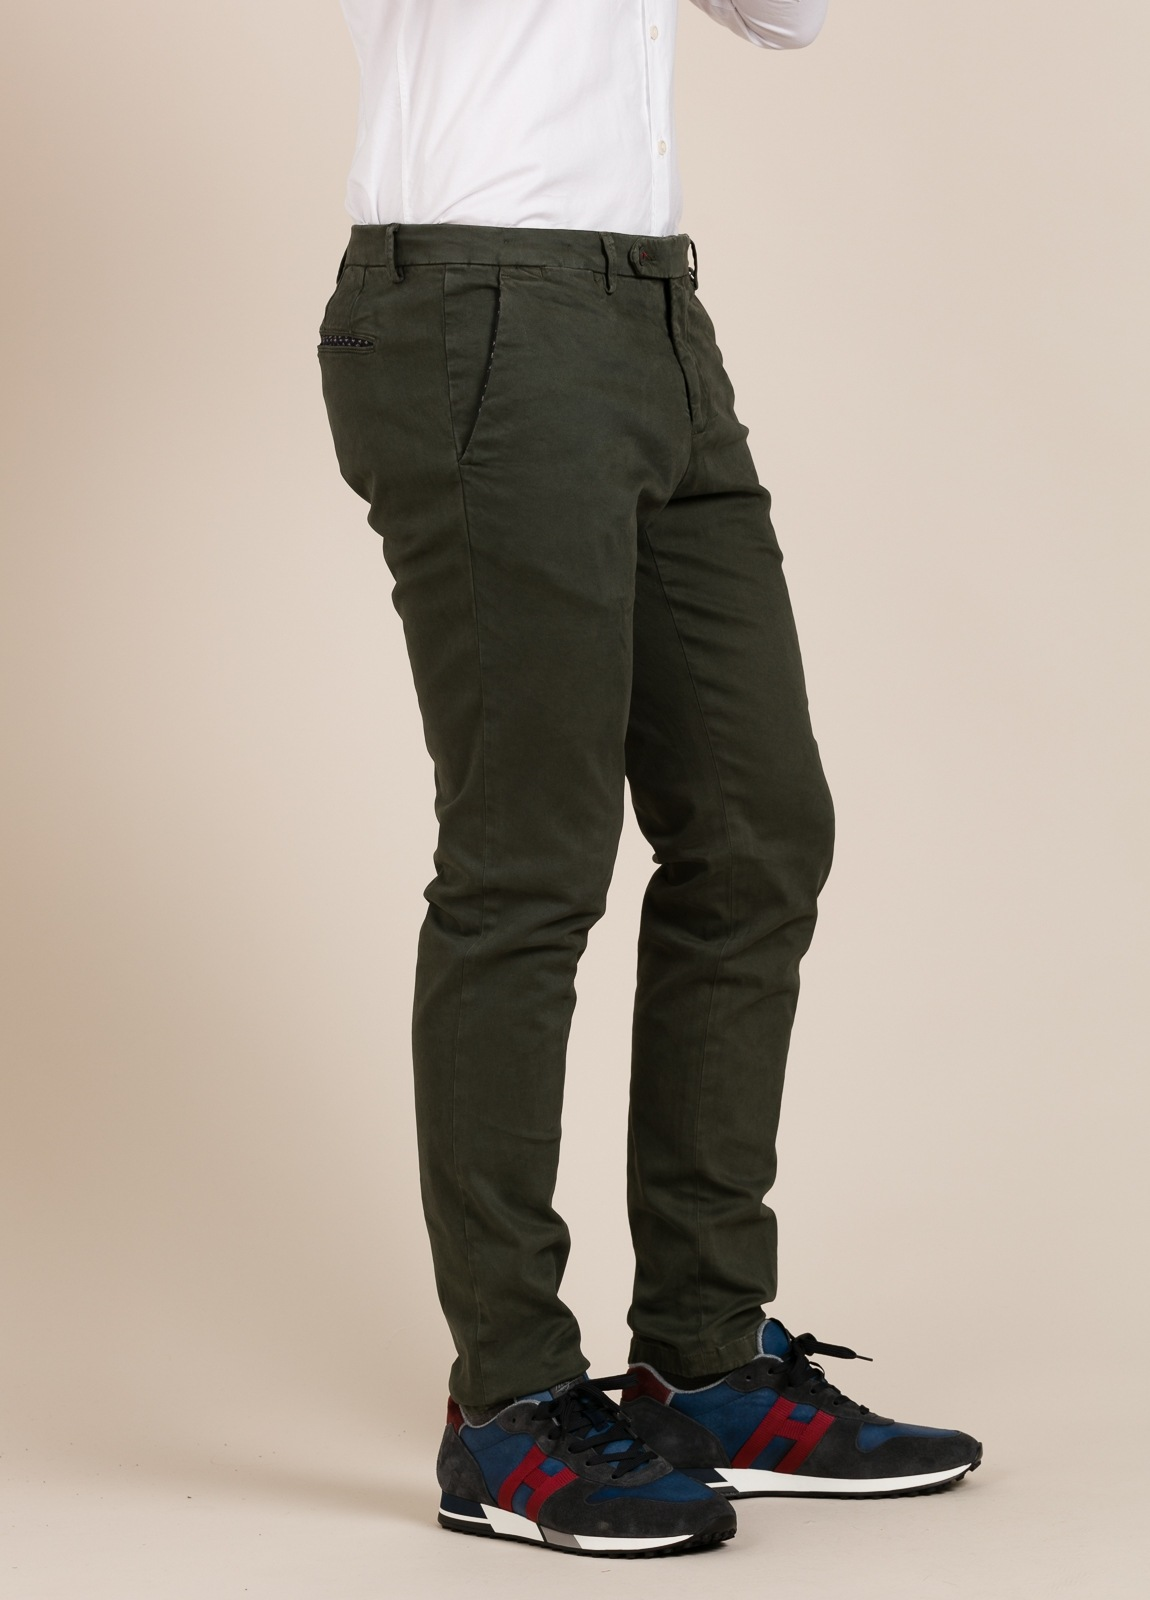 Pantalón chino PAOLONI verde kaki.